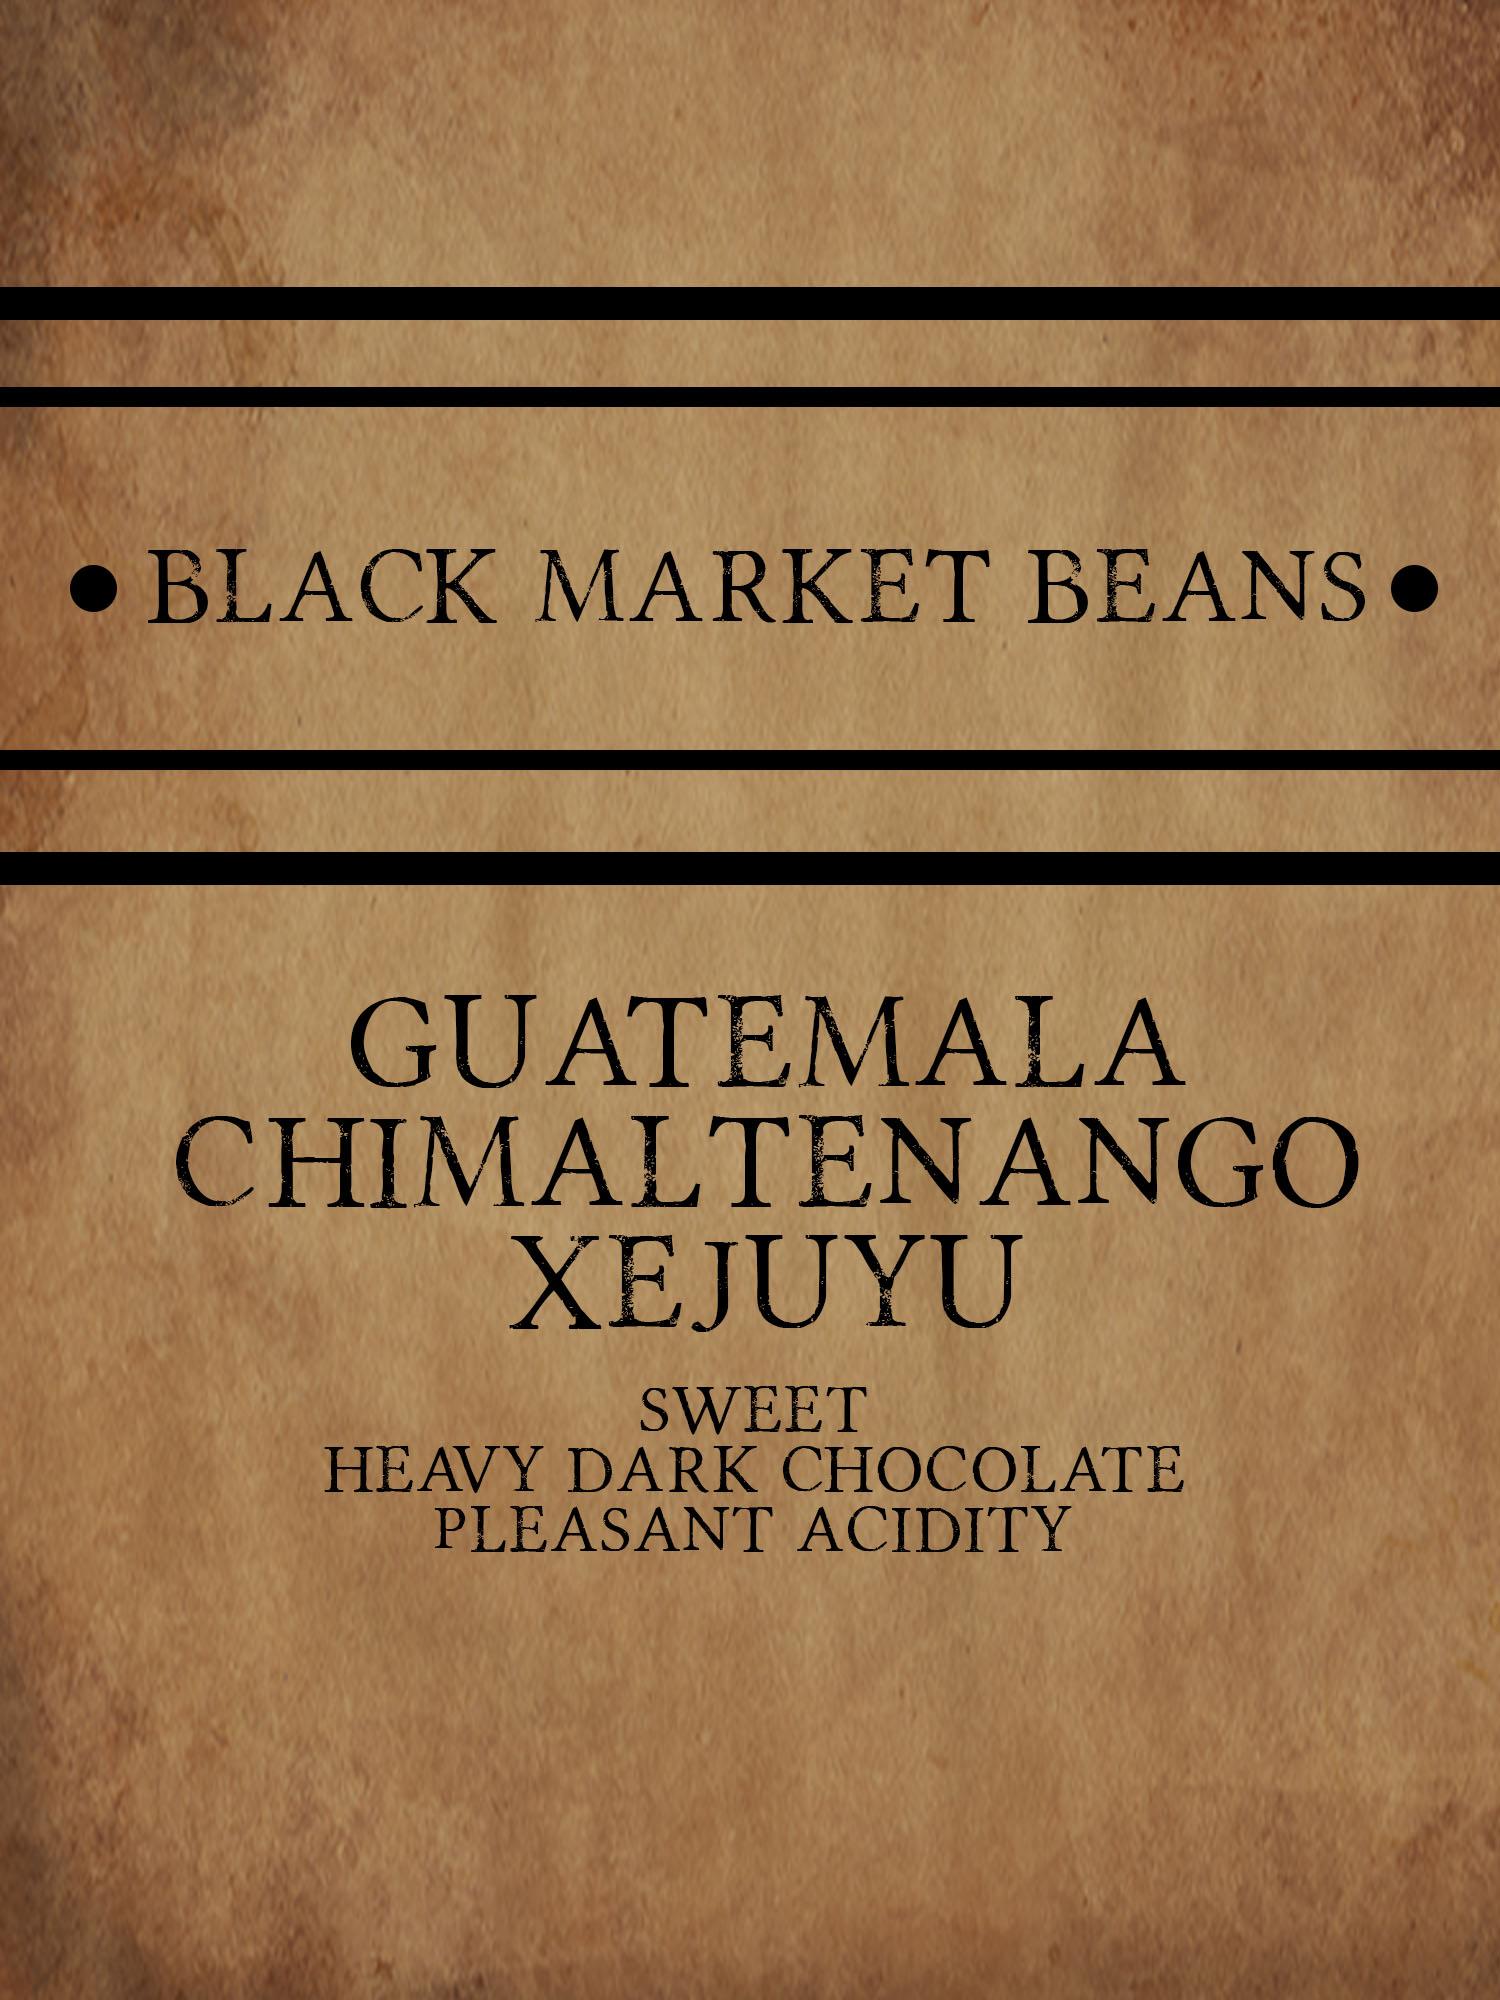 coffee_Guatemala_chimaltenango_xejuyu.jpg